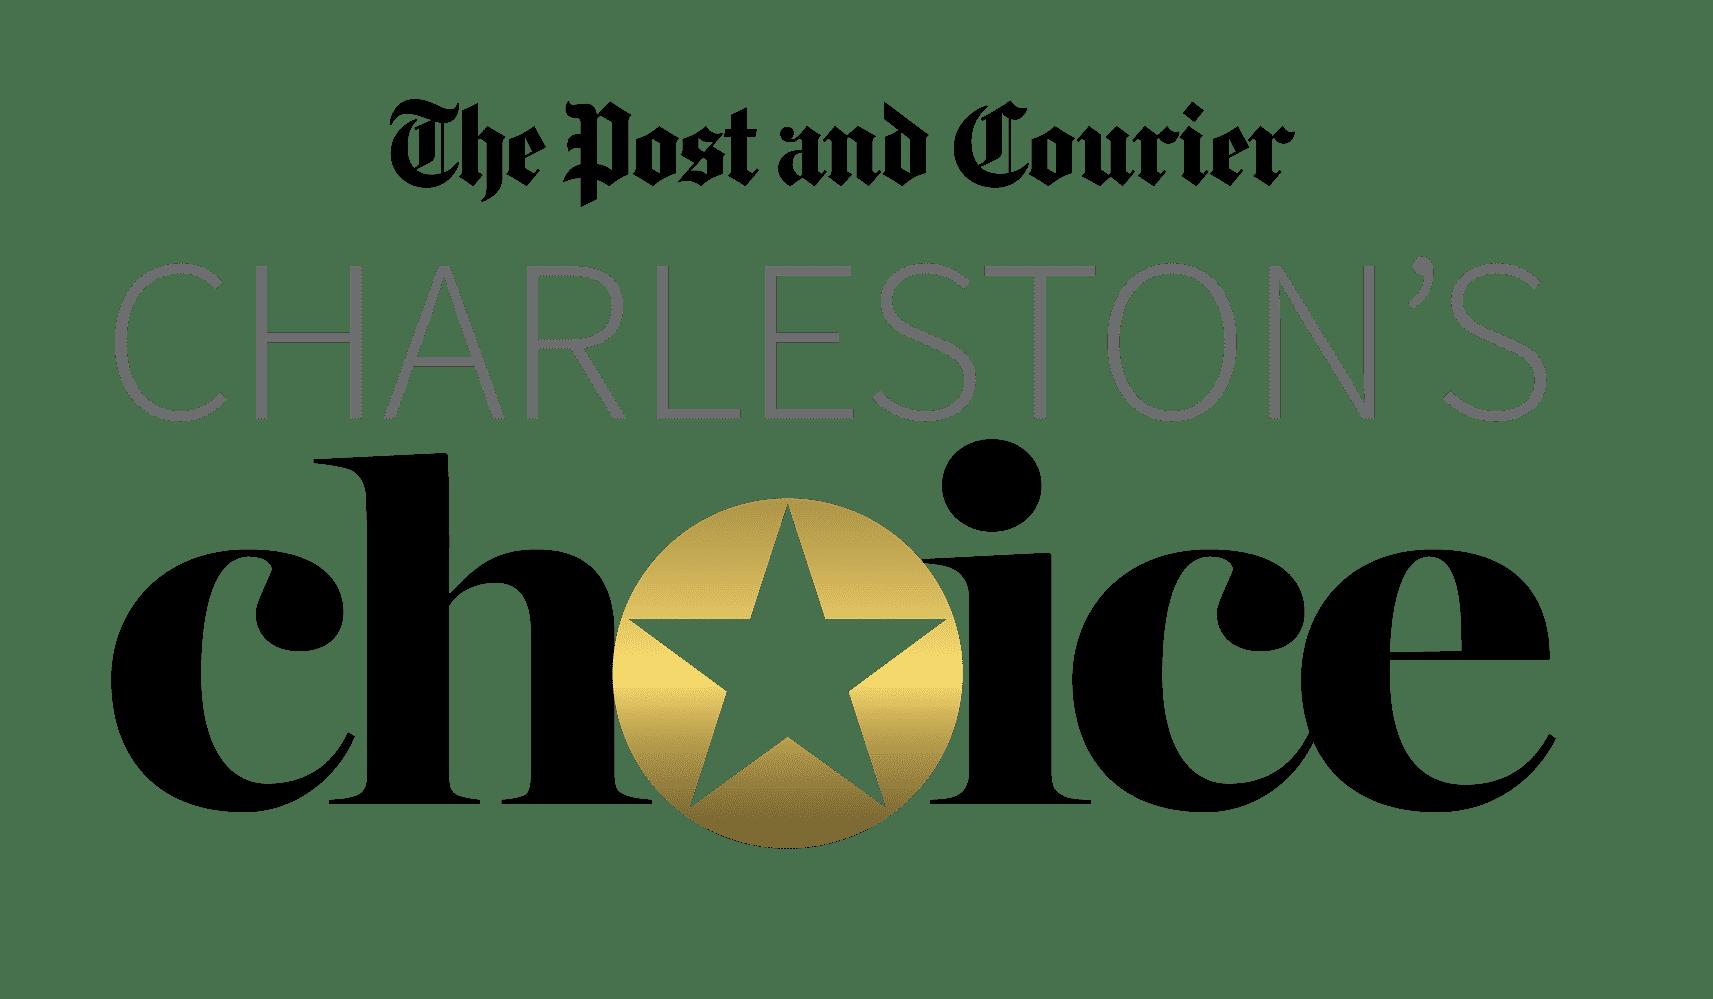 Charleston's CHOICE